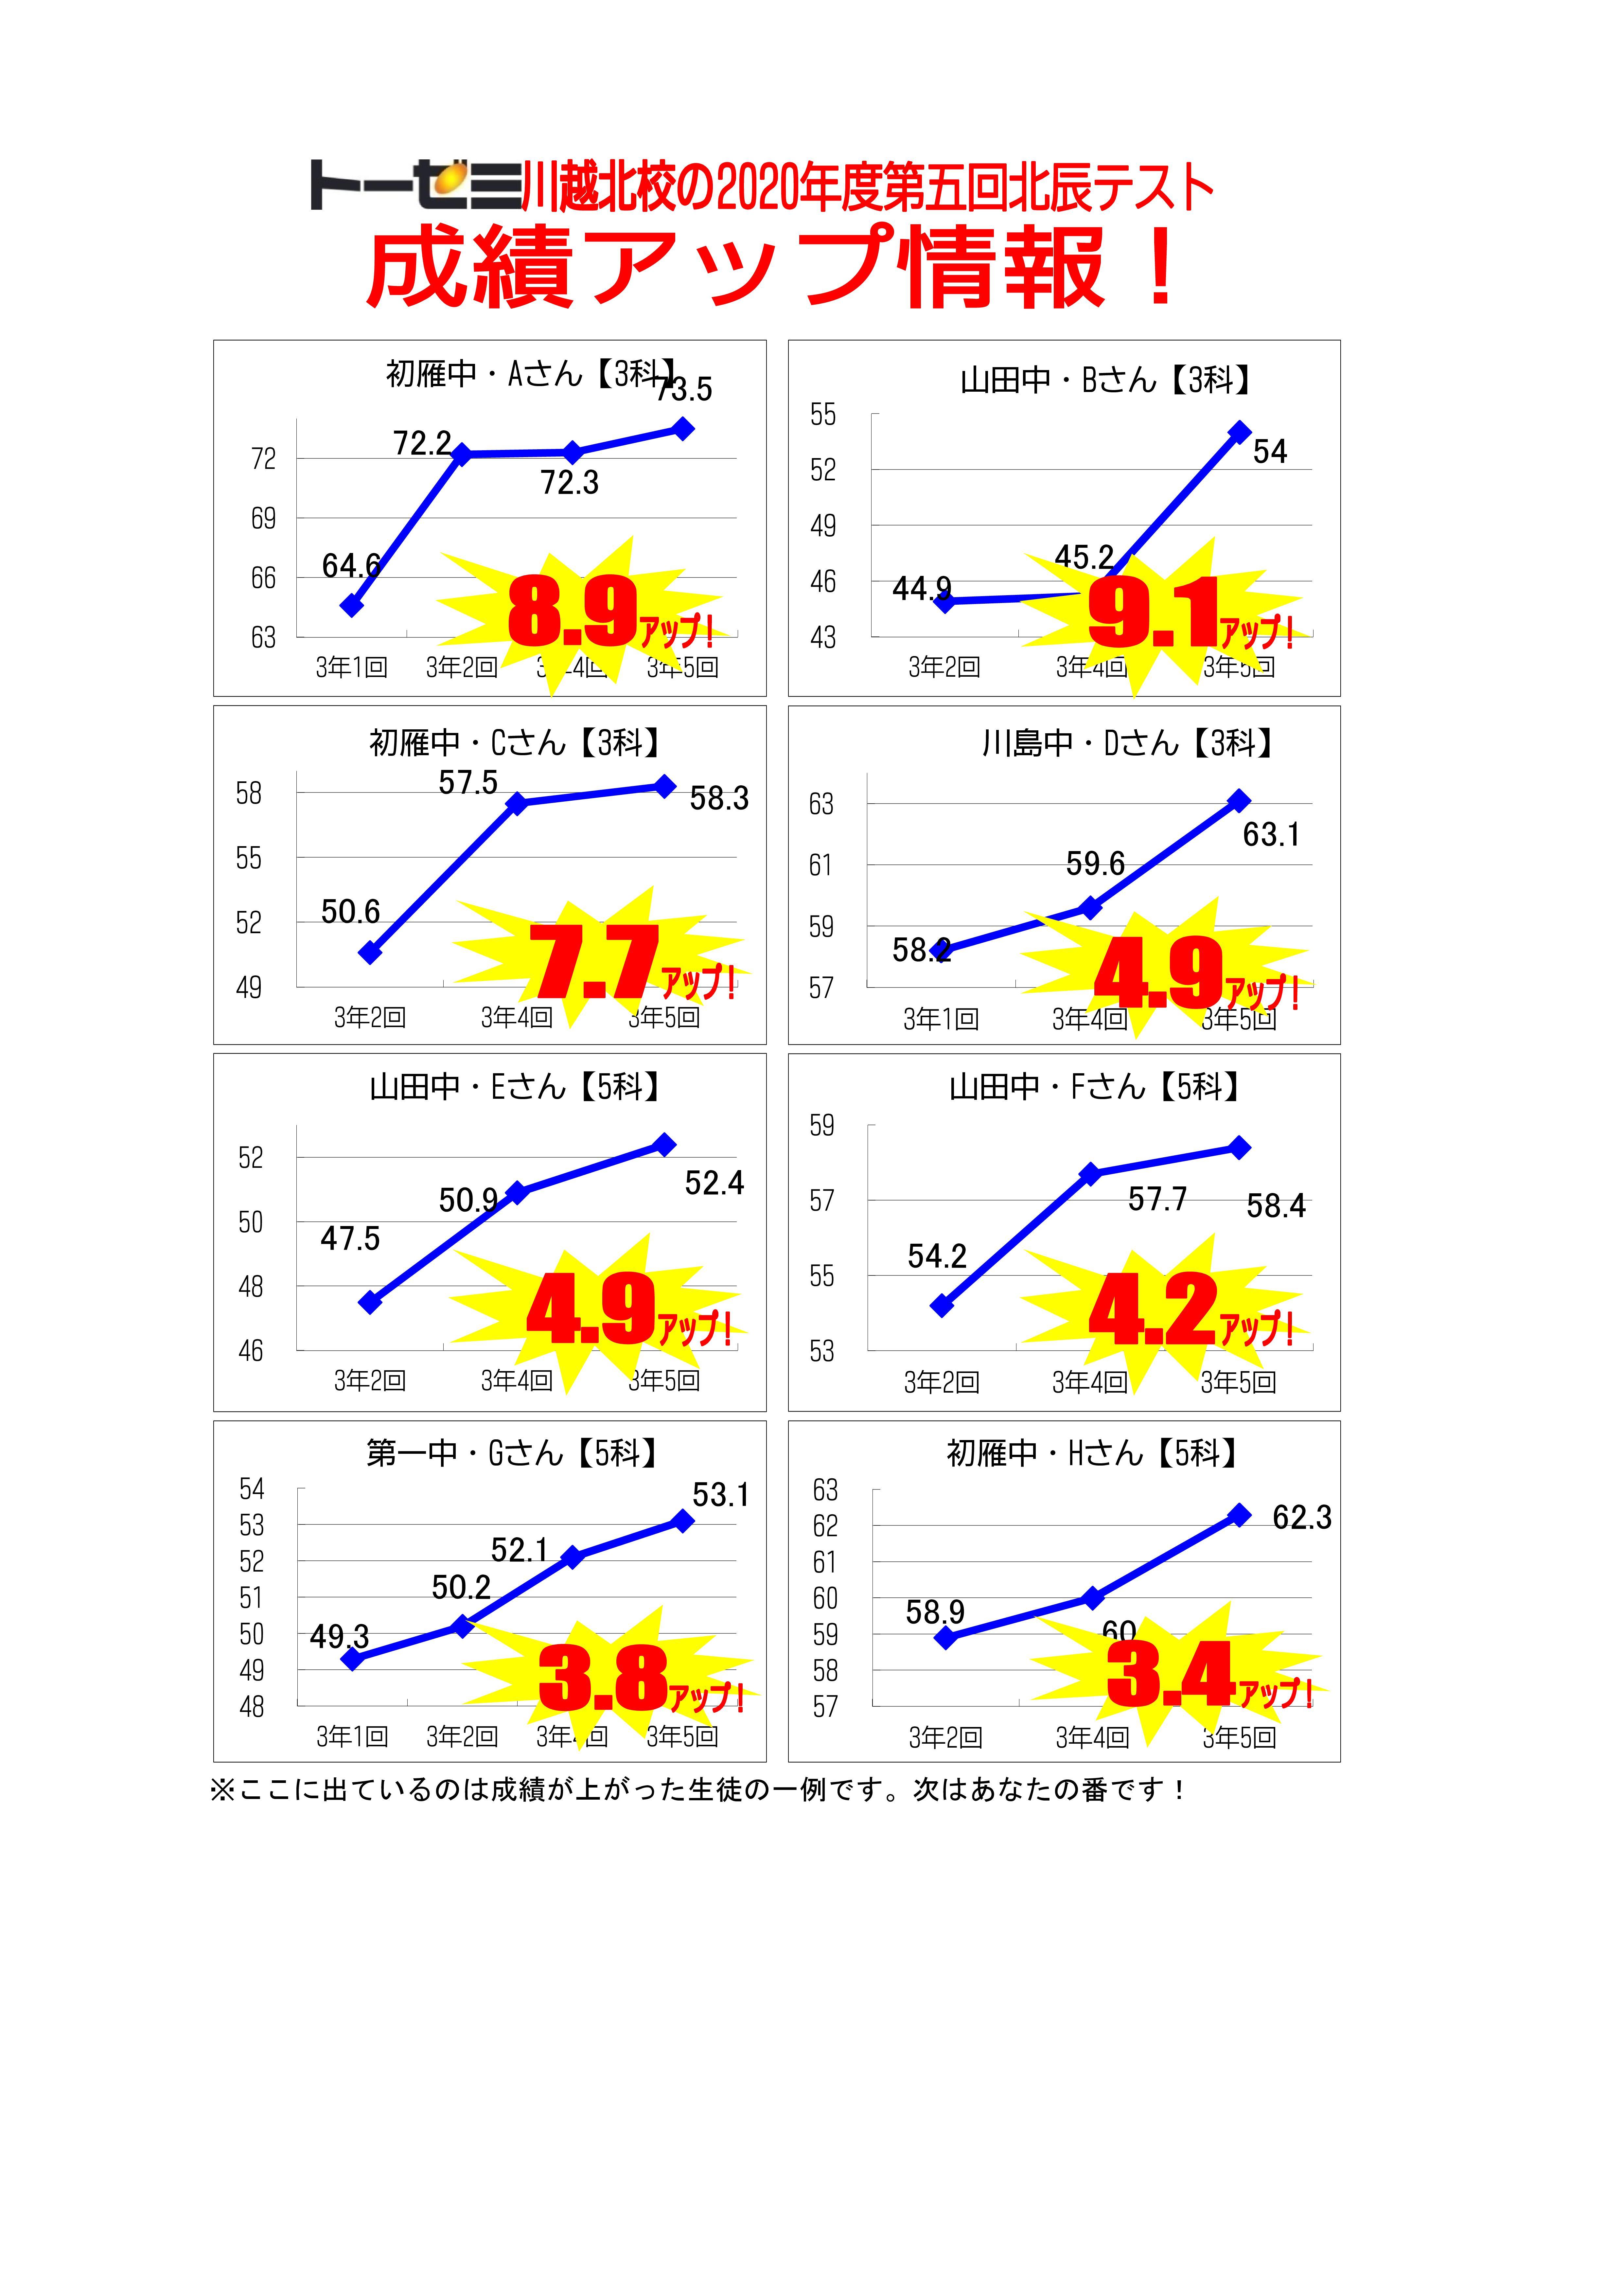 001-%e5%8c%97%e8%be%b0%e9%96%a2%e9%80%a3%e3%80%90%e6%94%b9%e3%80%91